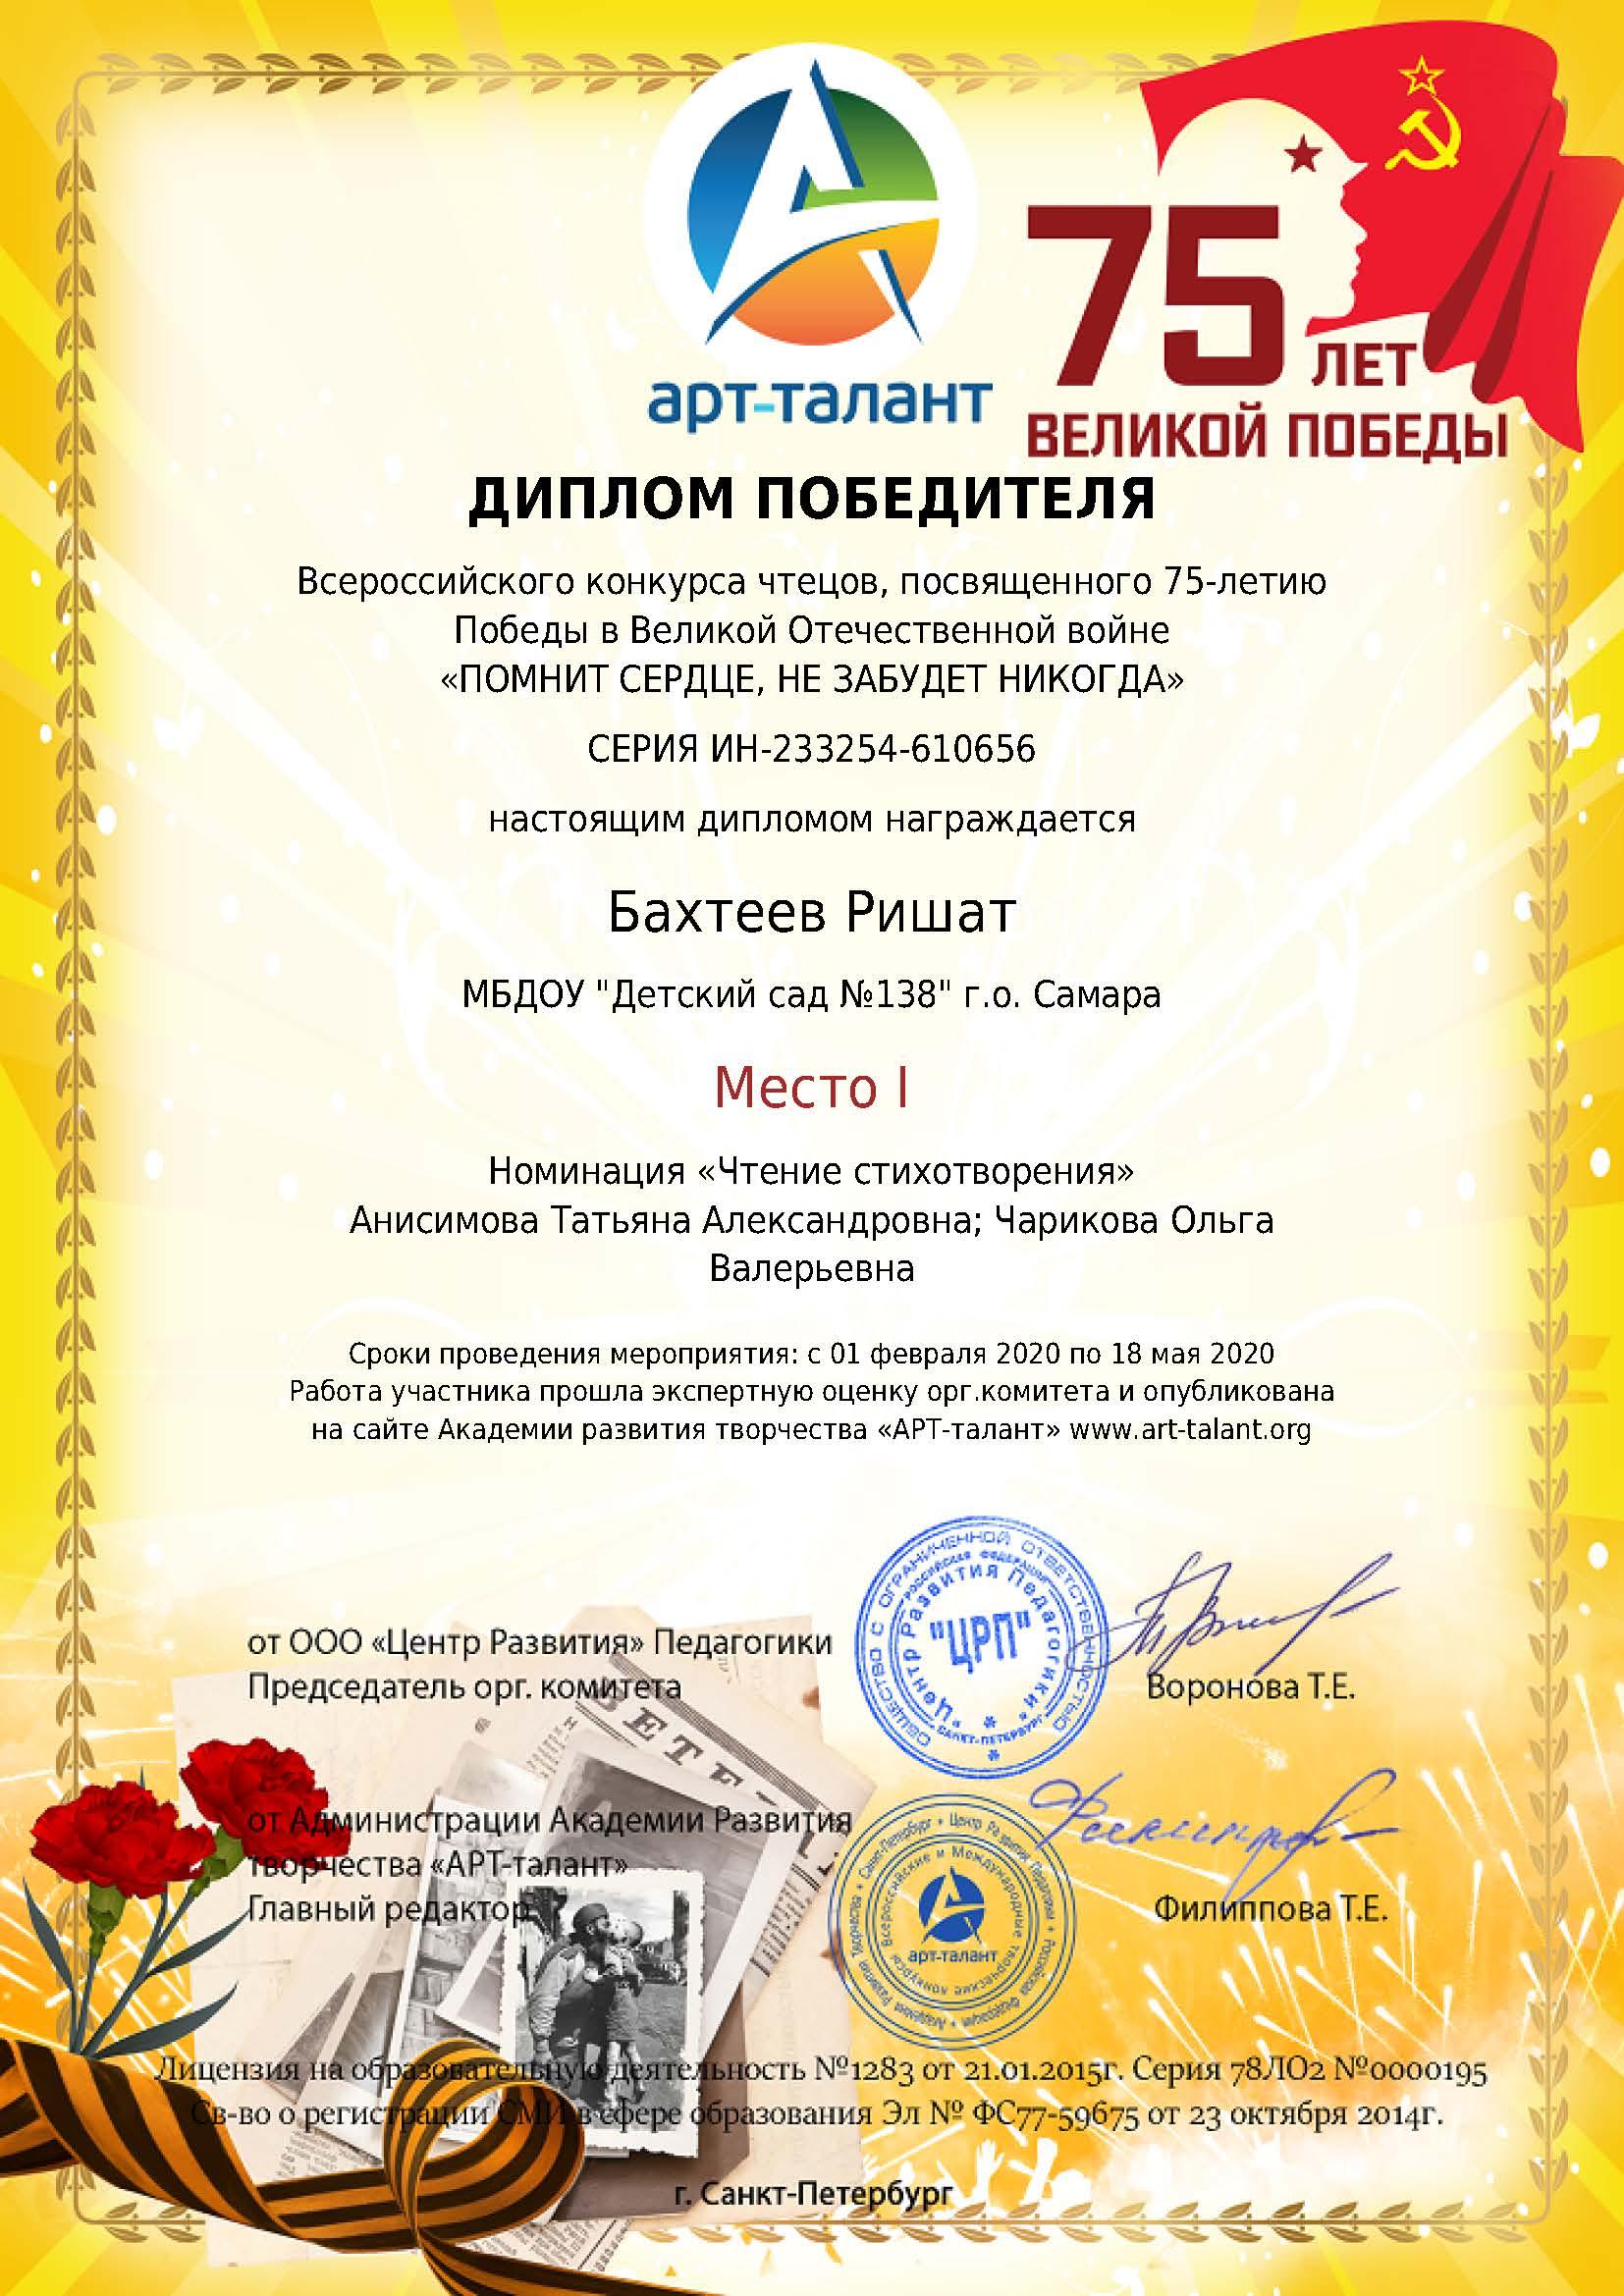 Бахтеев Ришат (1)